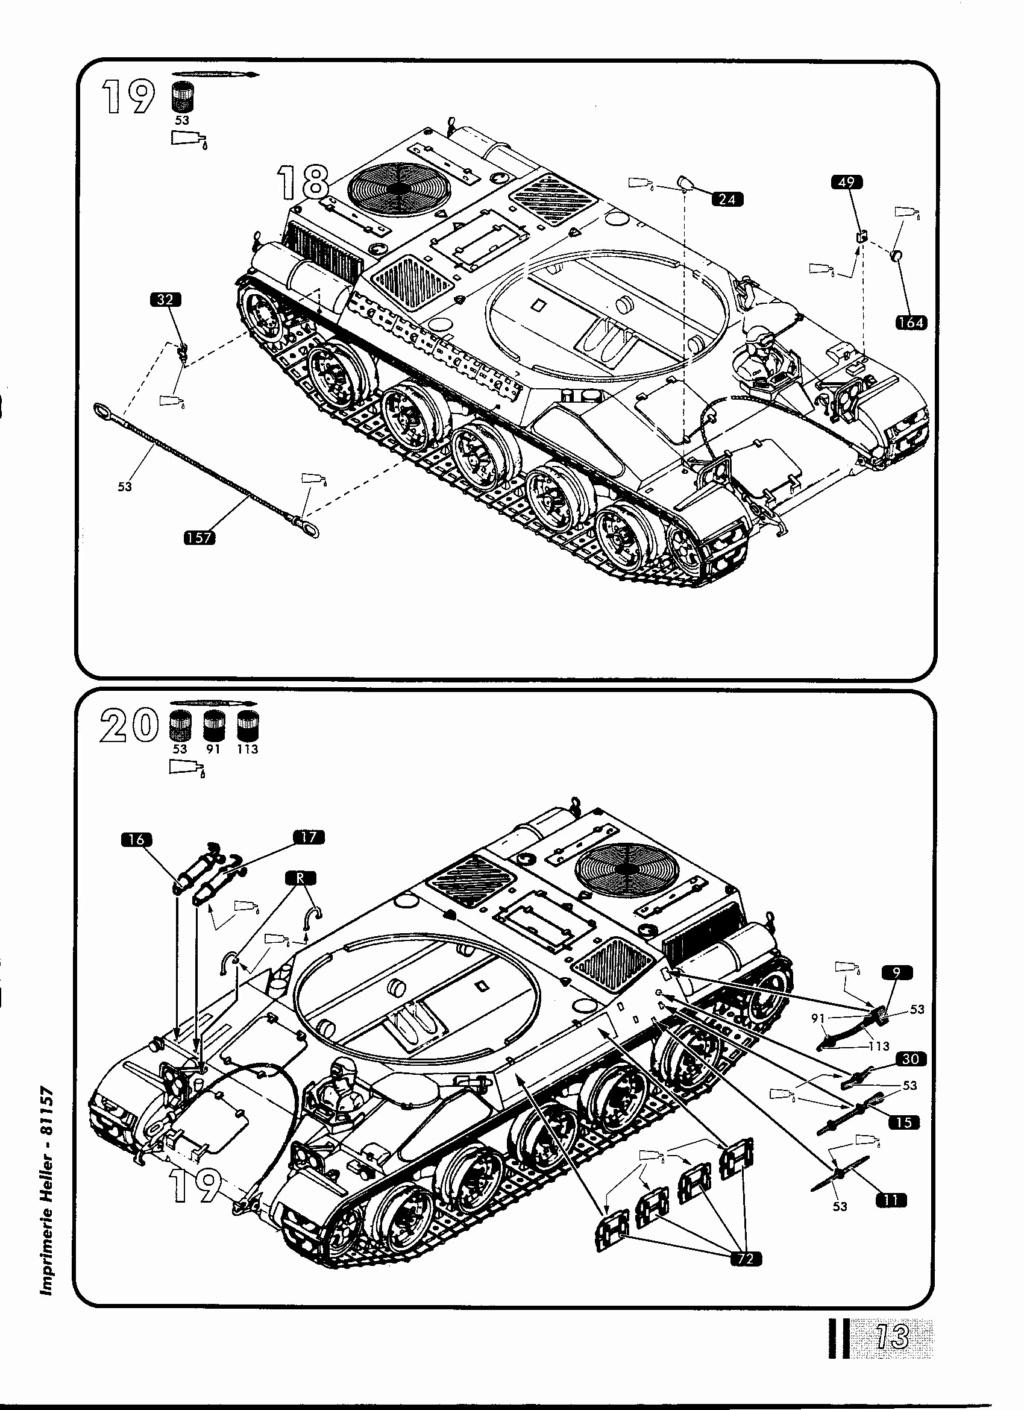 "[HELLER] AMX 30 B2 ""Opération DAGUET"" (UPGRADE) 1/35ème Réf 81157 Notice29"